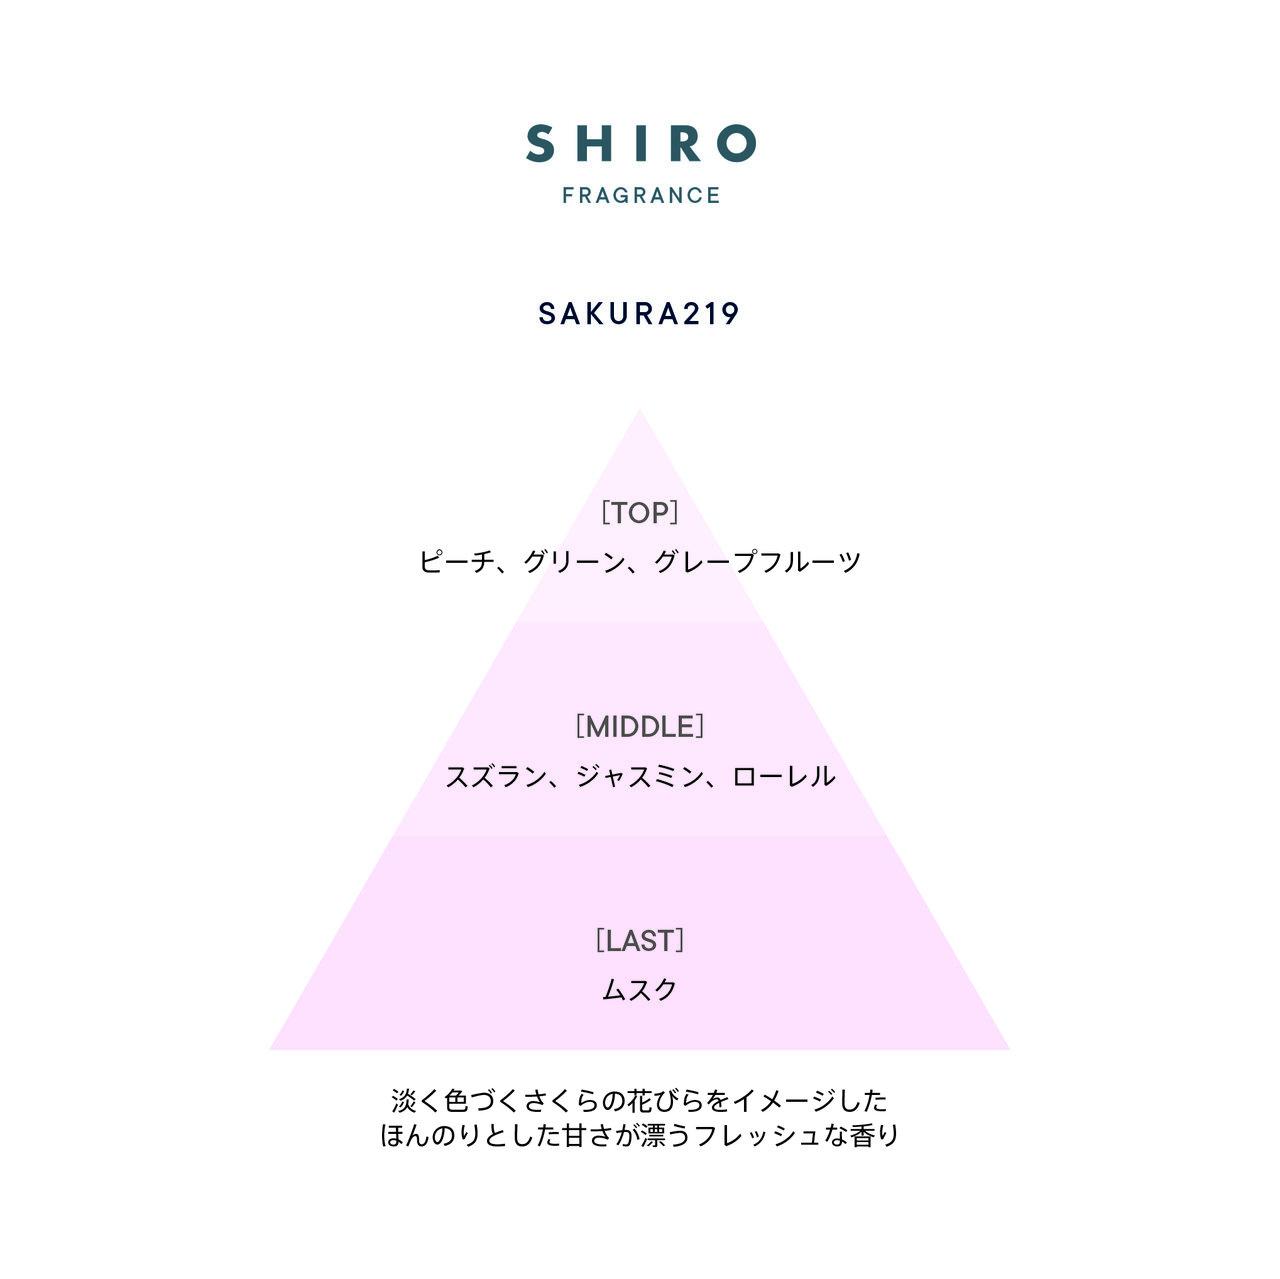 SHIRO(シロ) 『さくら219 』香調